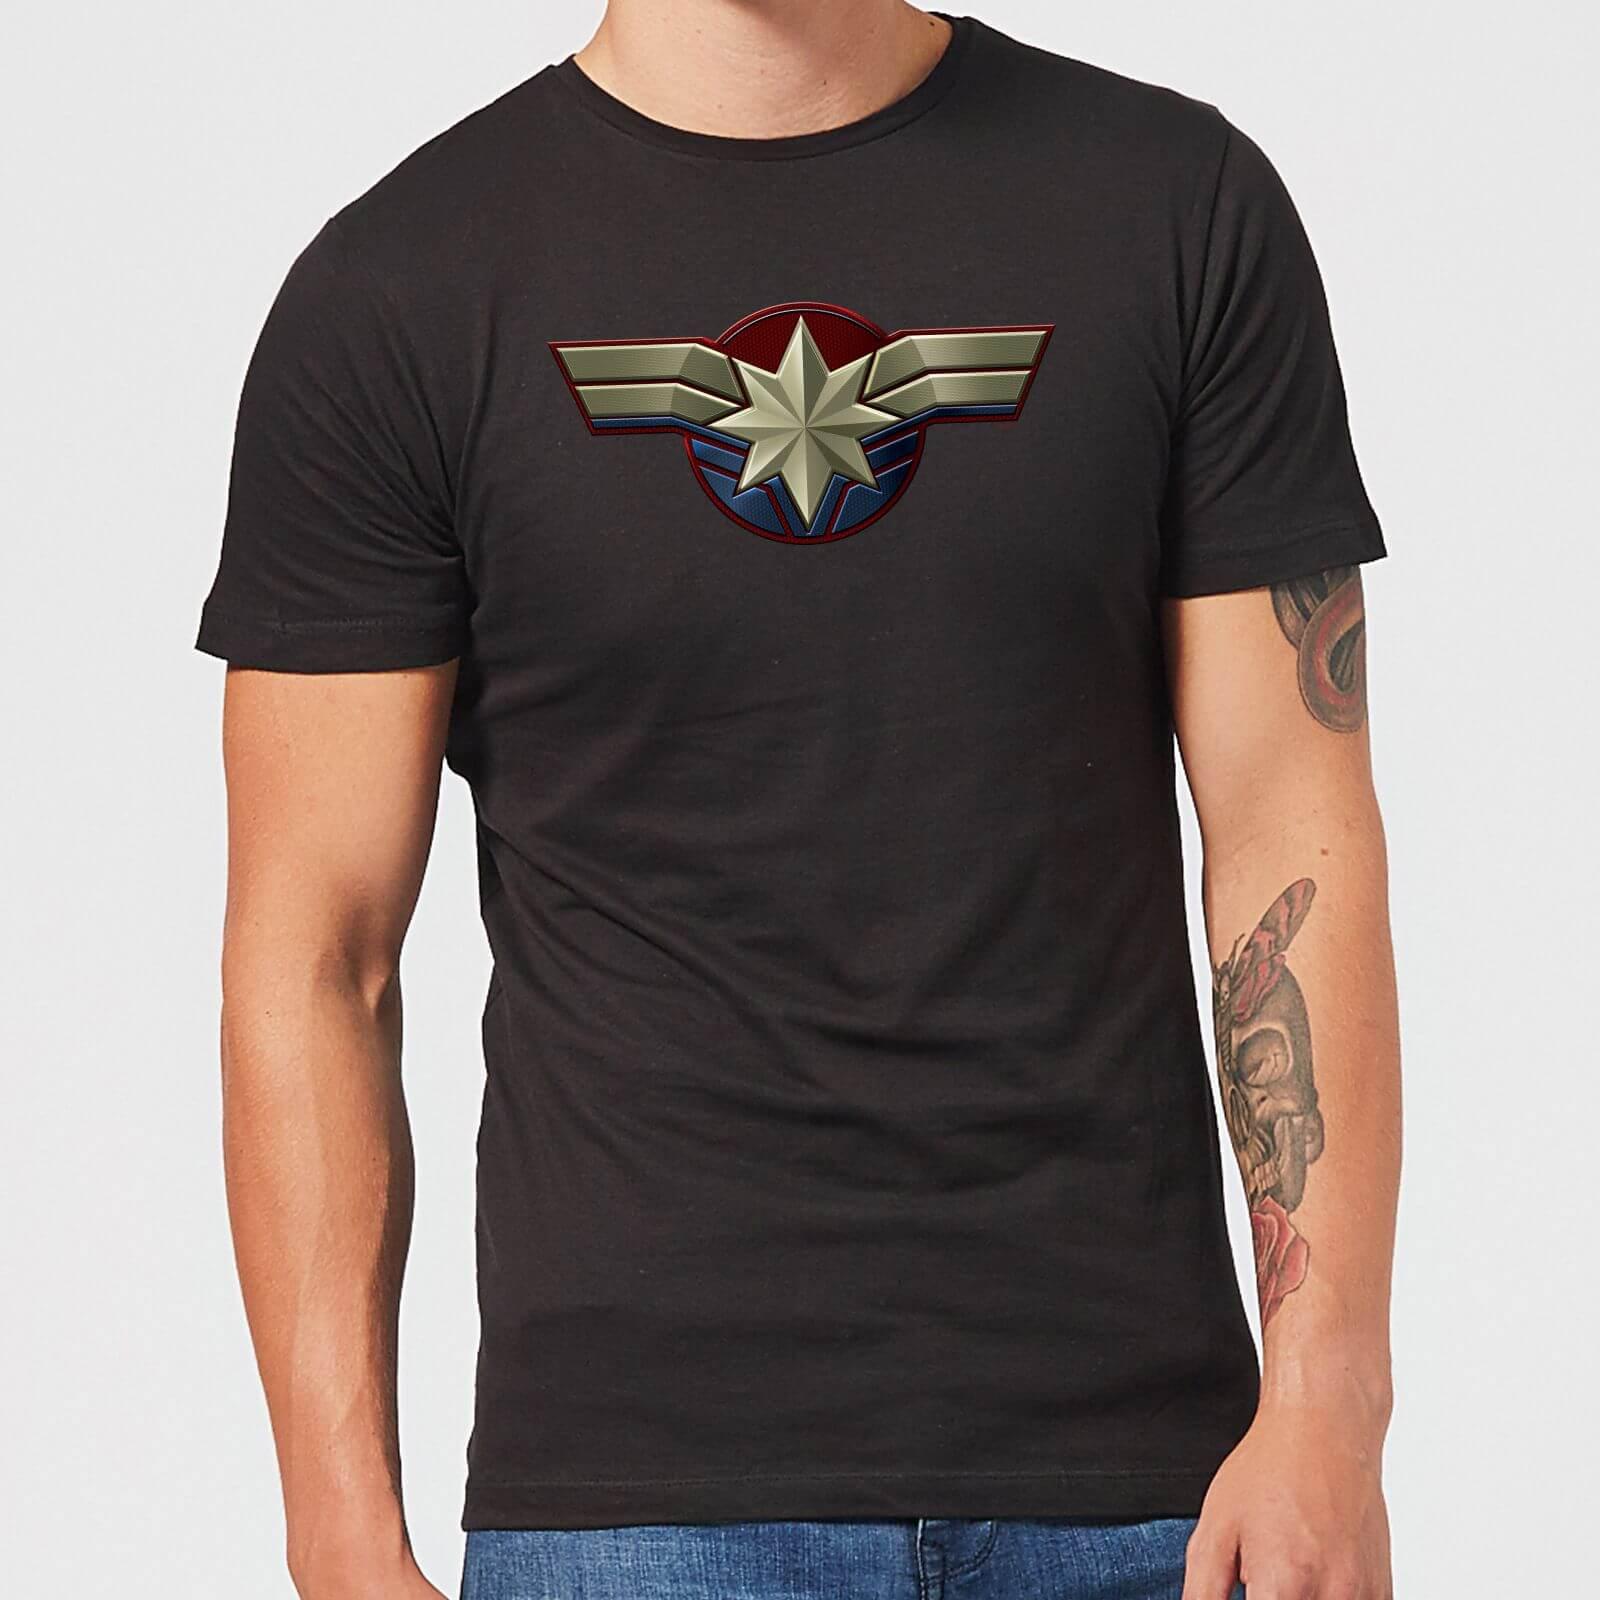 597c1bb6 Captain Marvel Chest Emblem Men's T-Shirt - Black Clothing | Zavvi